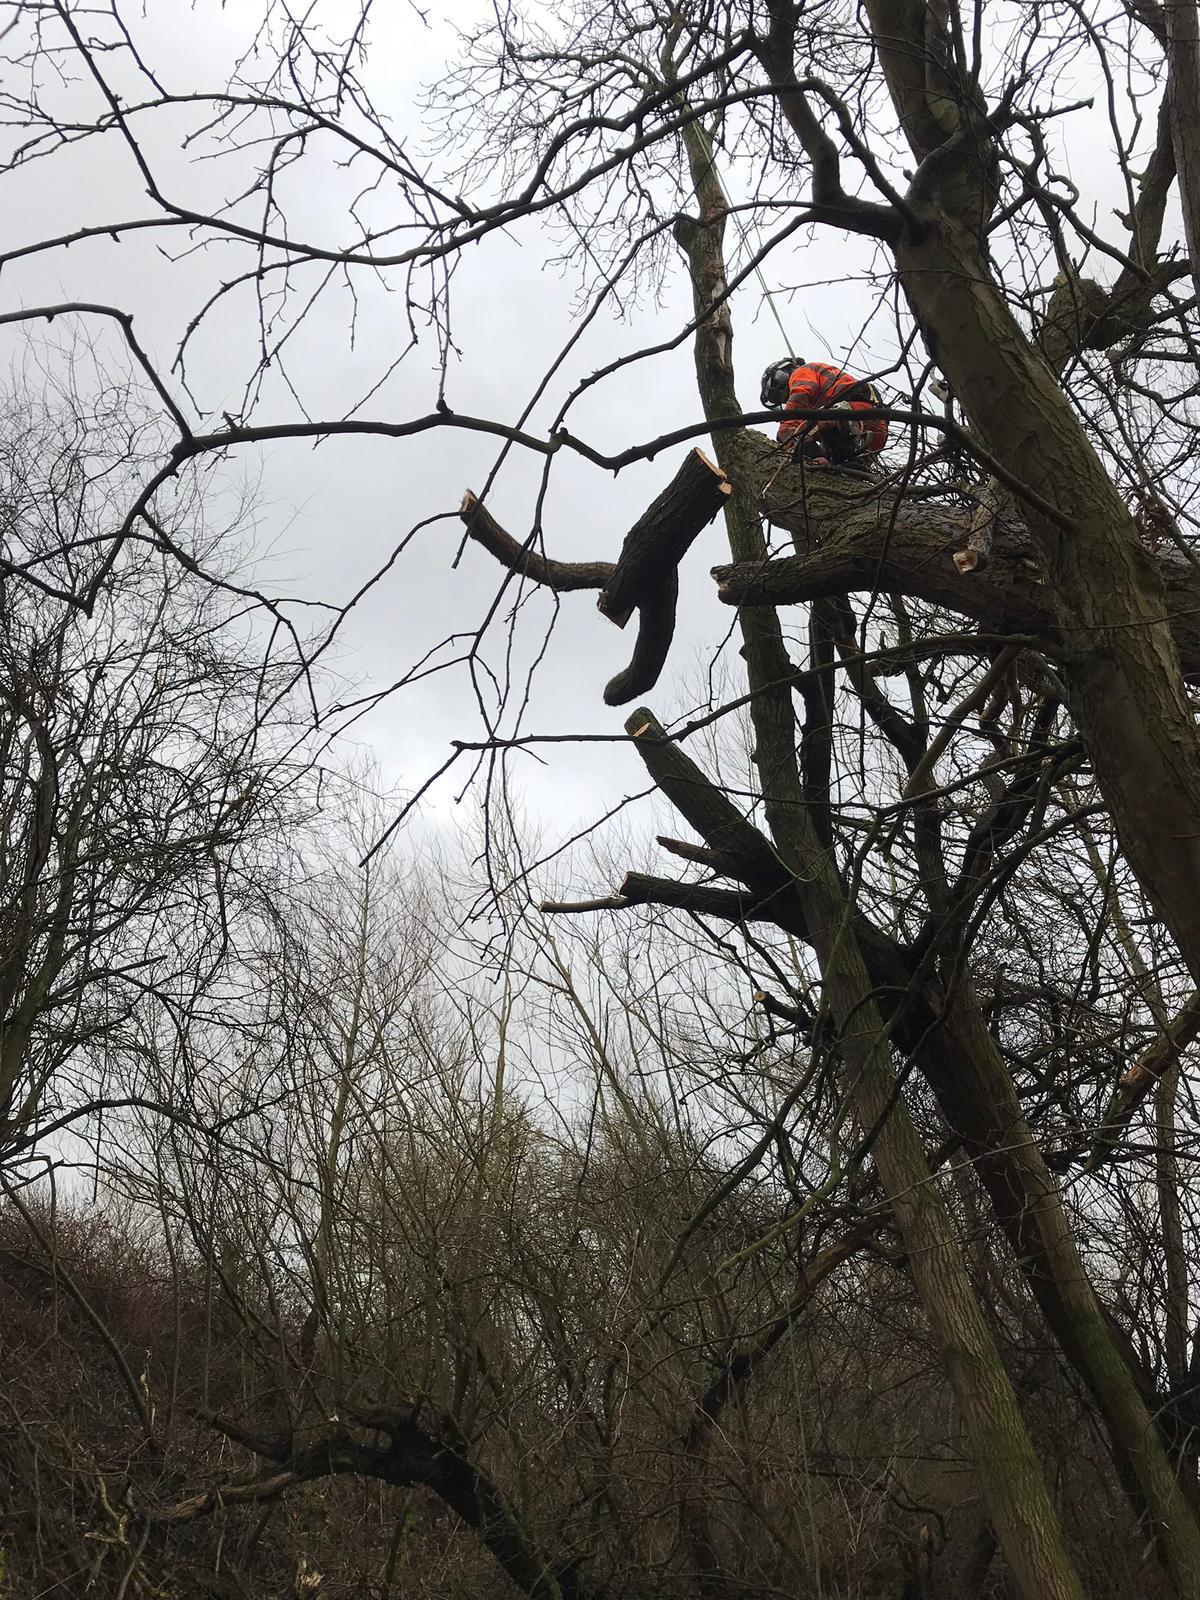 Arborist Branch Removal